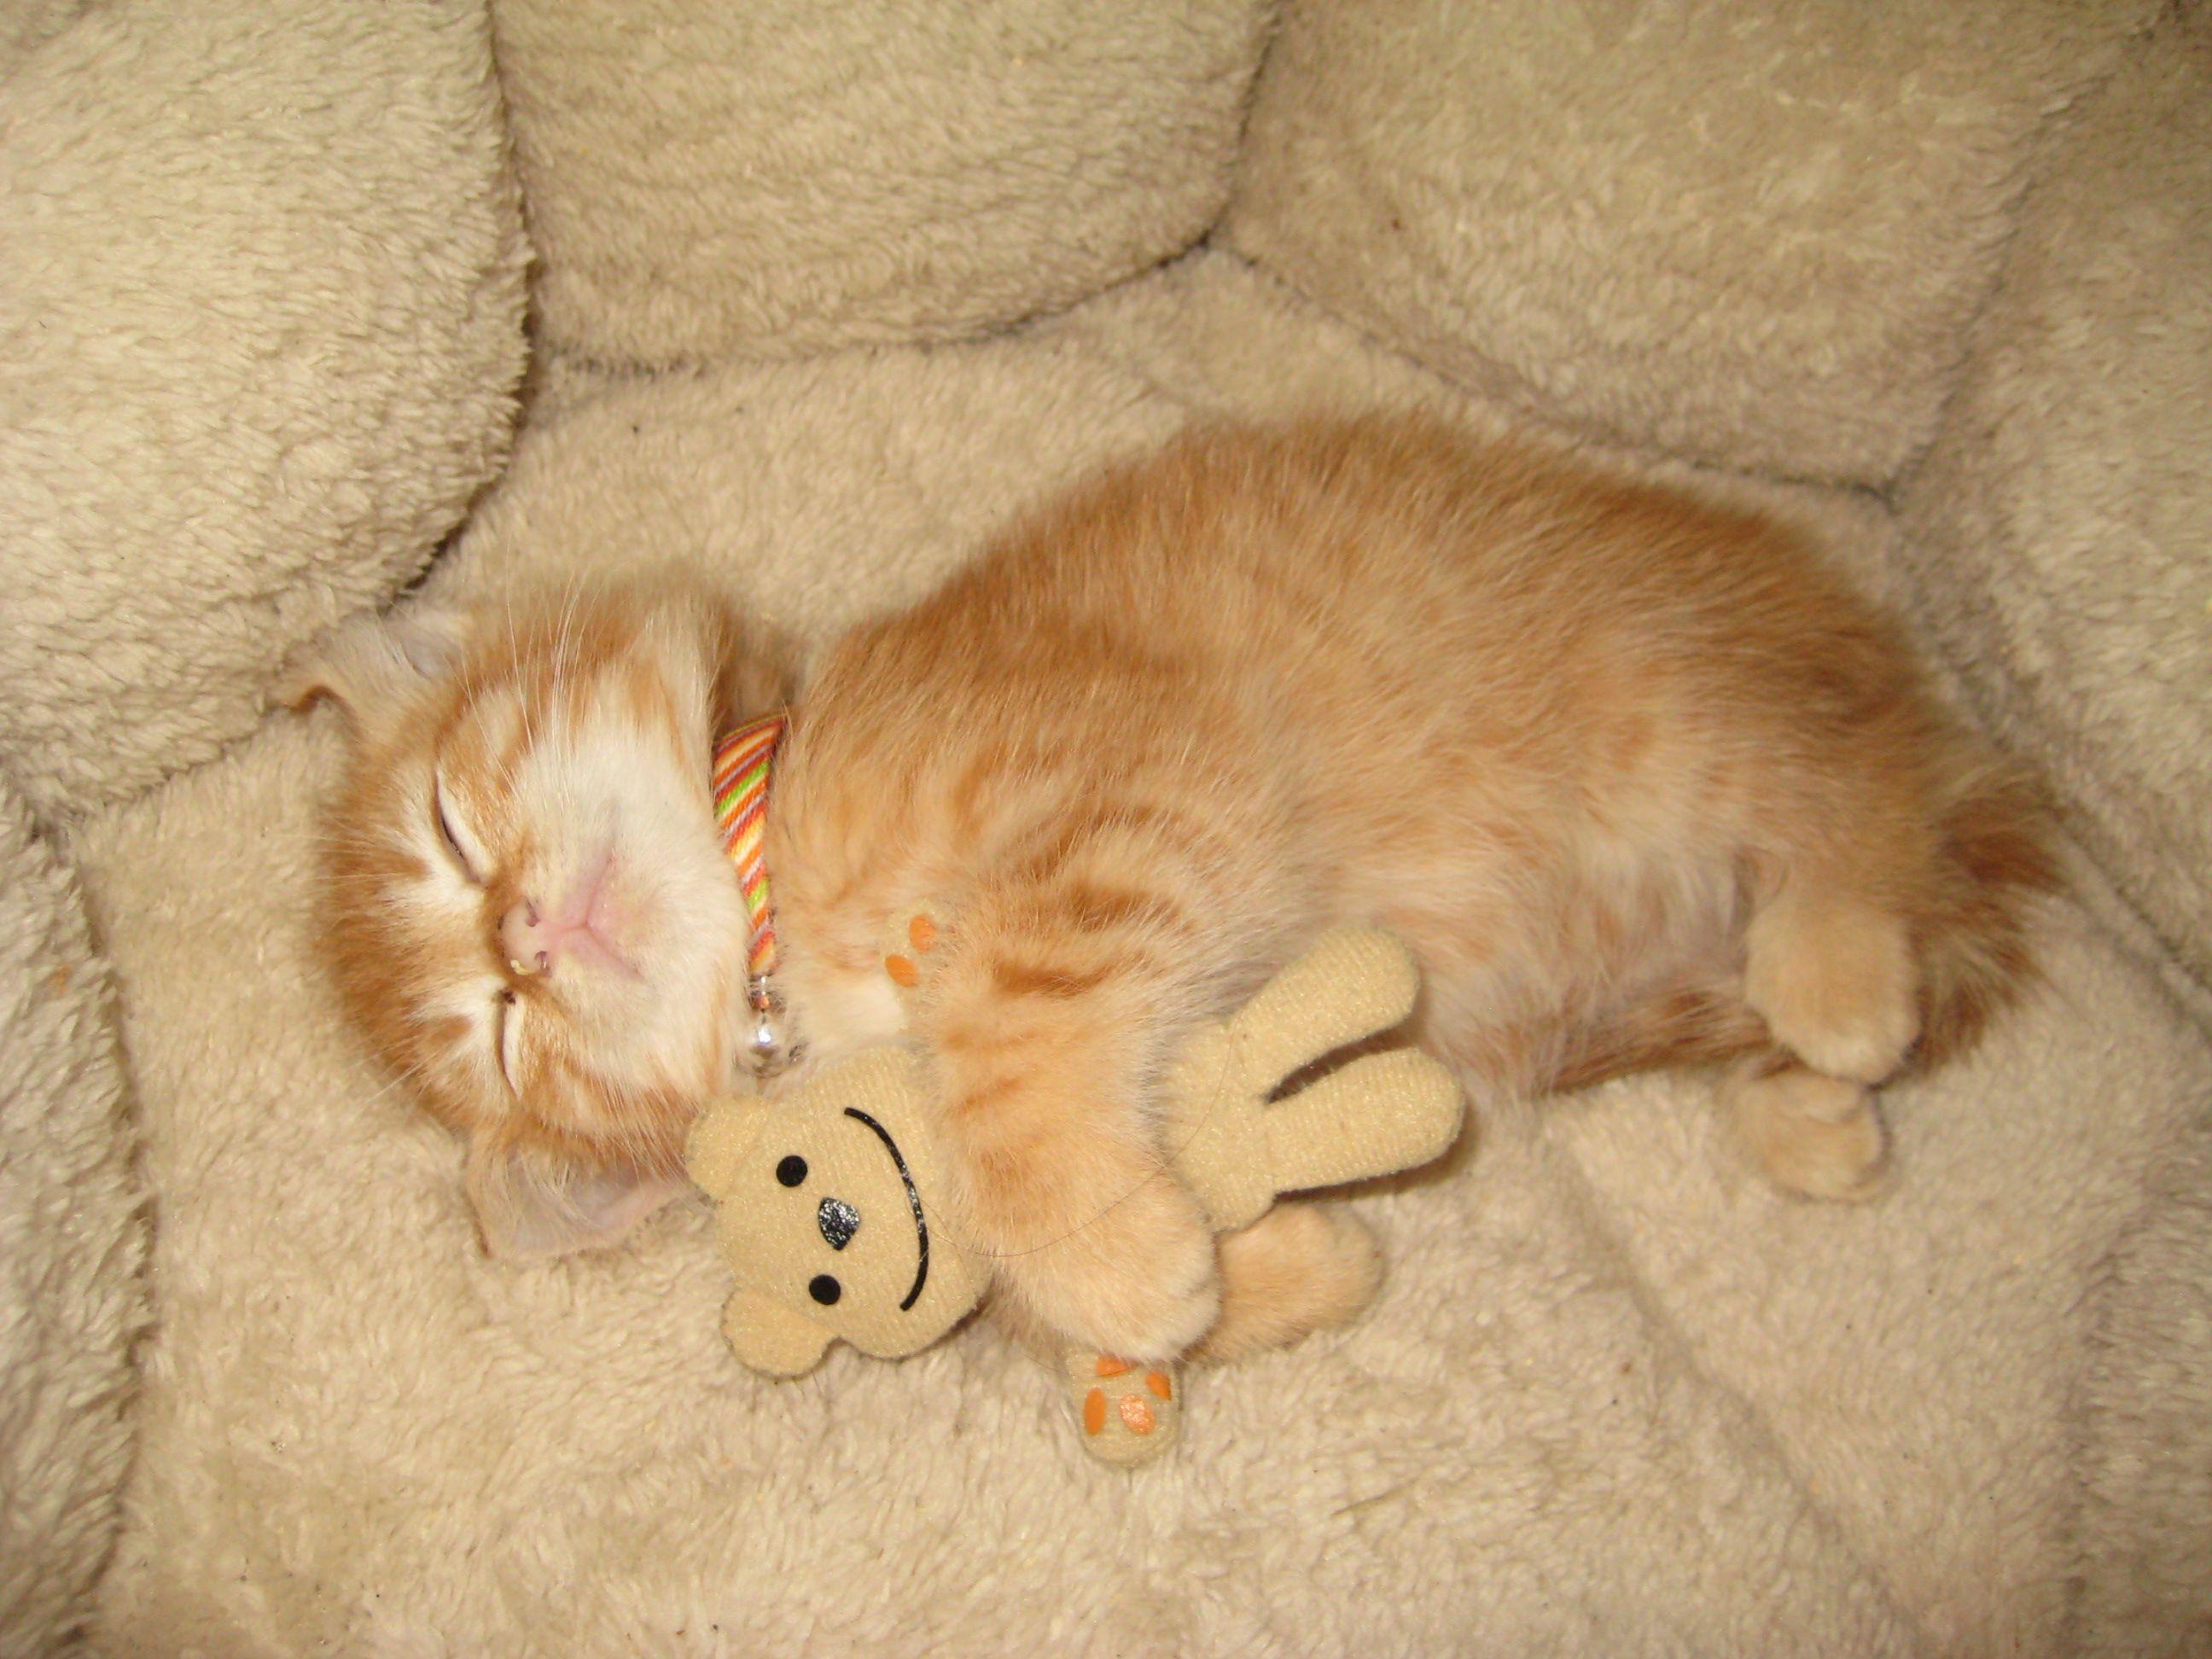 My Kitten Hugging Her Bear Imgur Baby Animals Cute Animal Pictures Kittens